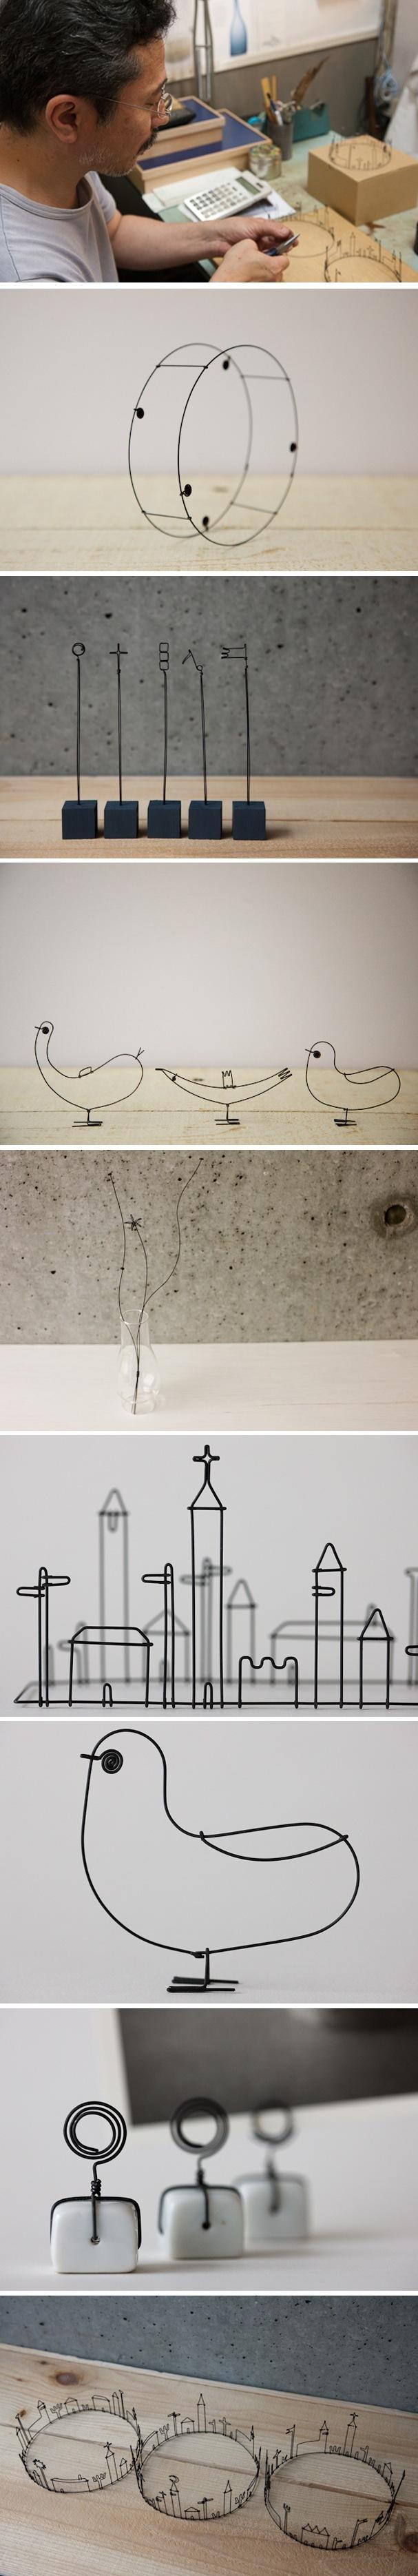 Masao Seki's works